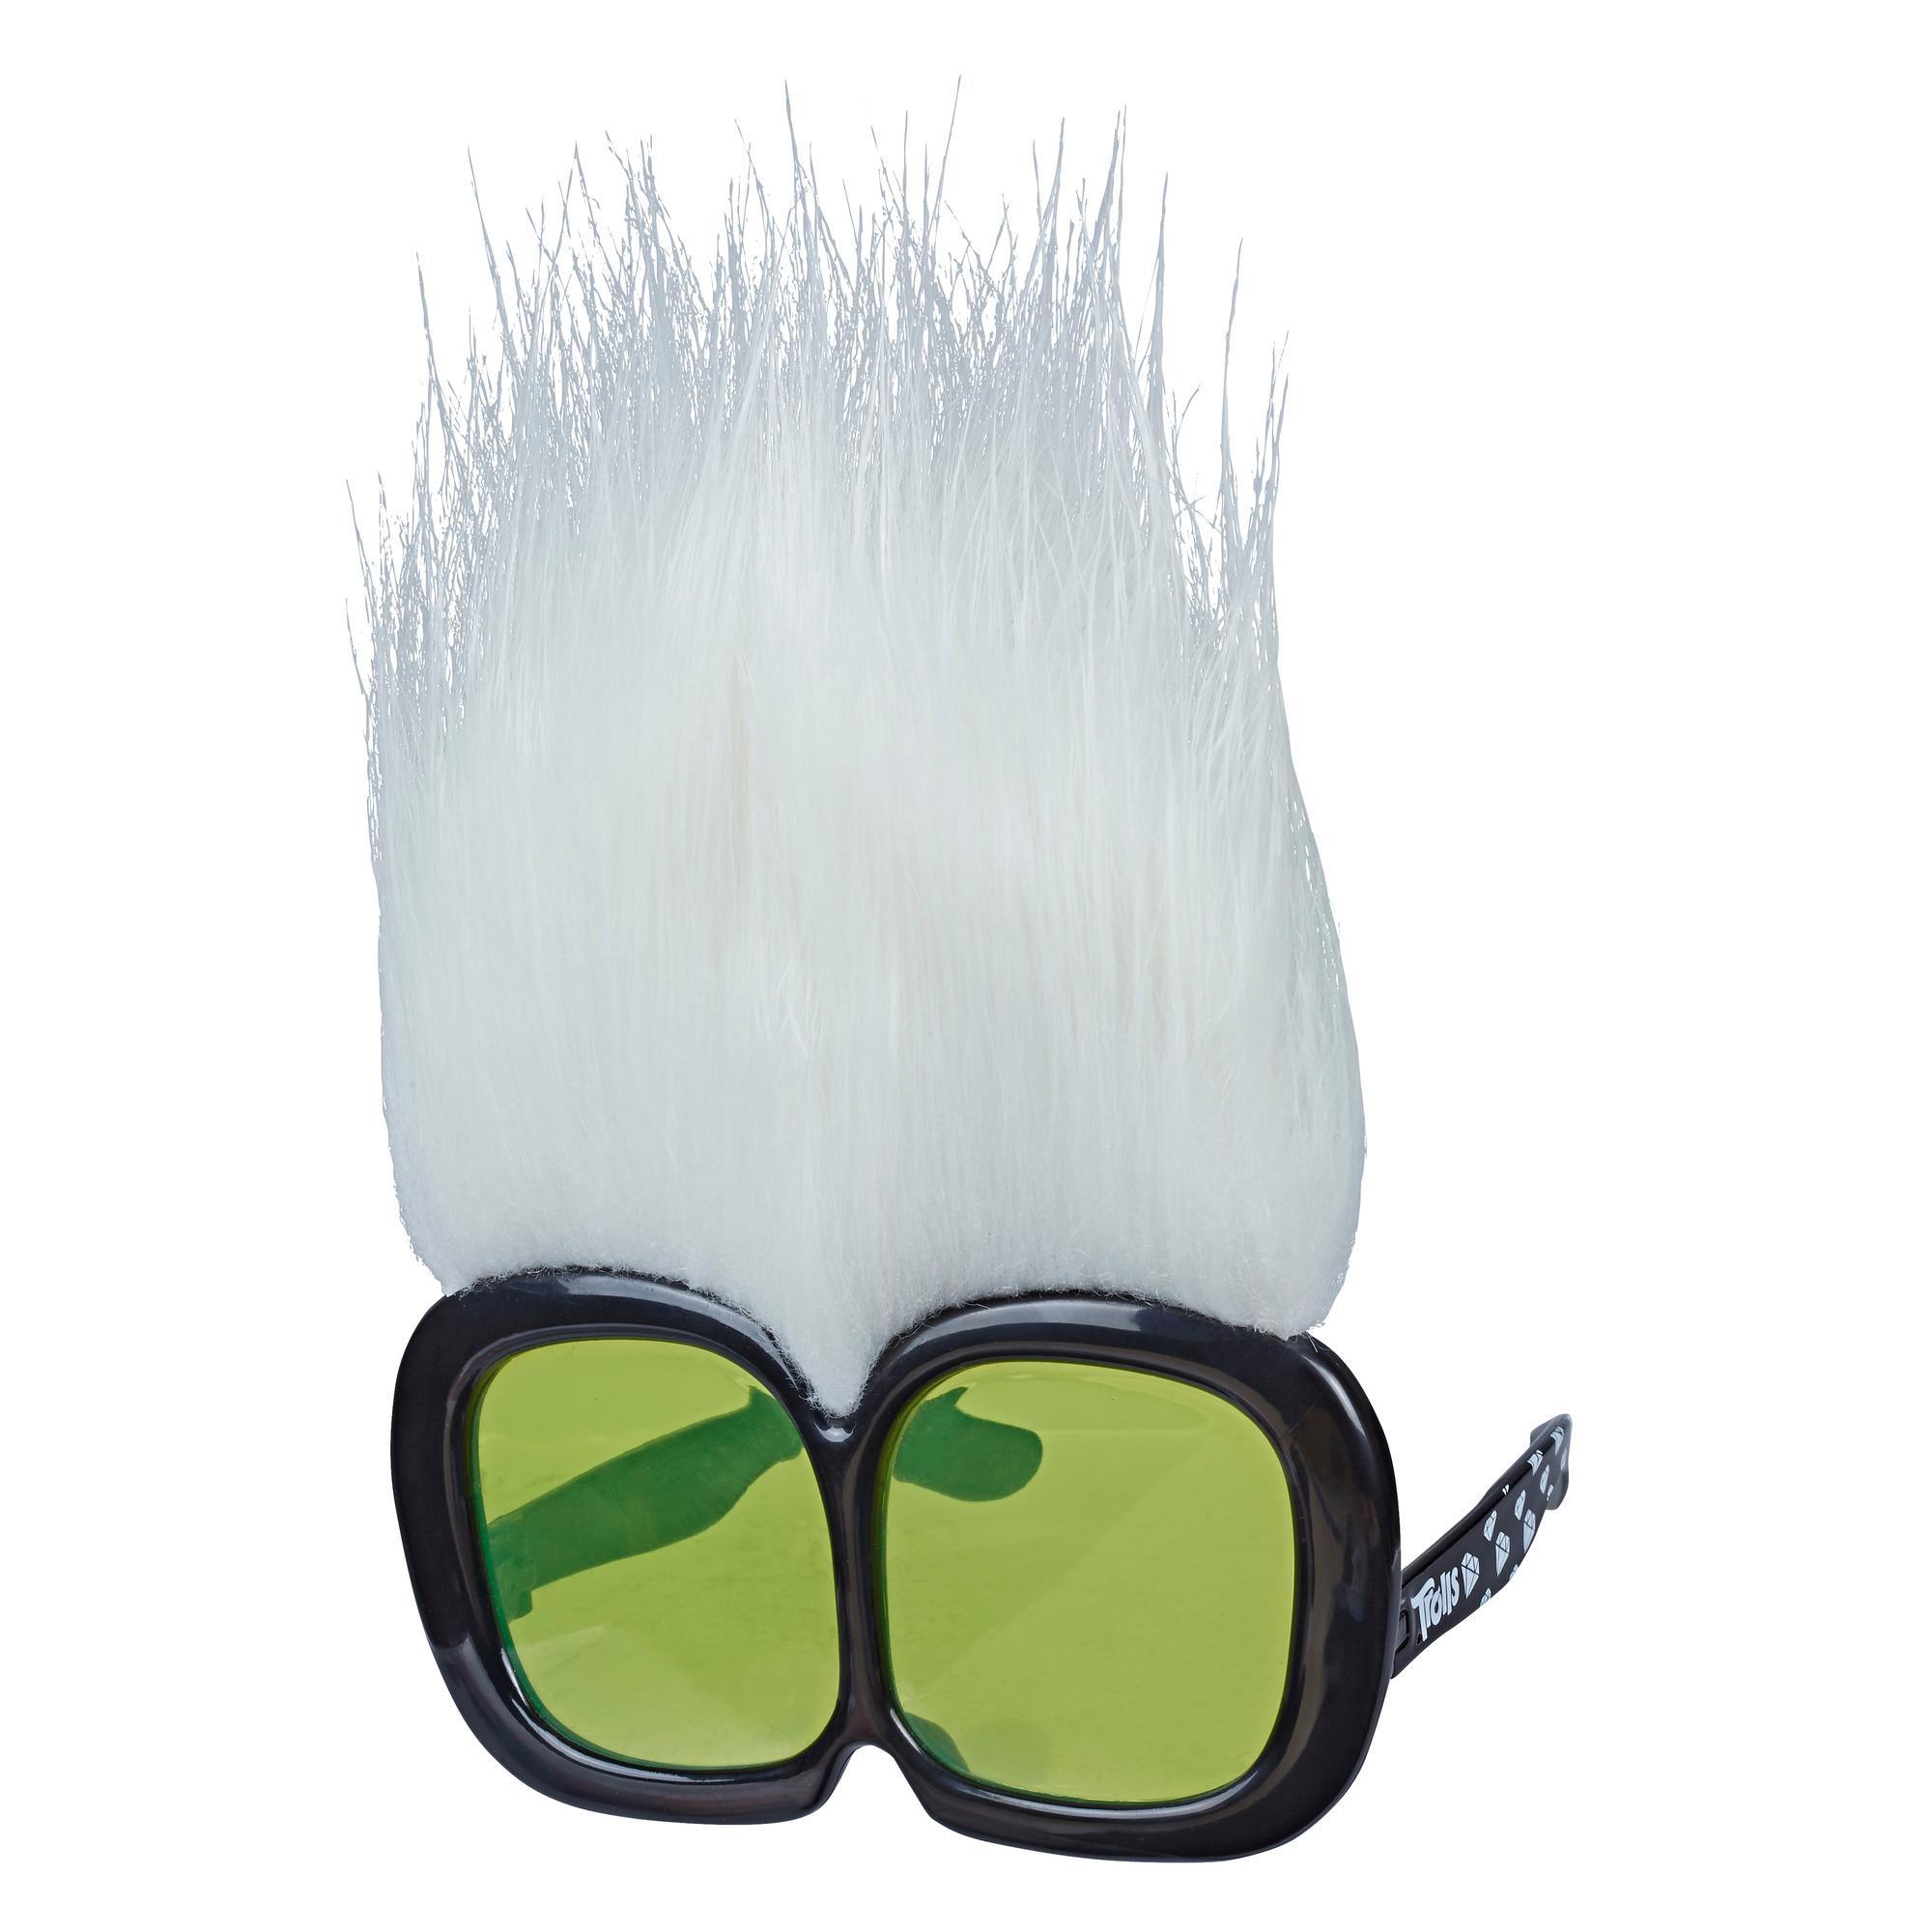 Look disco de Tito Diamante de DreamWorks Trolls, Divertidas gafas de sol inspiradas en la película Trolls 2: Gira Mundial